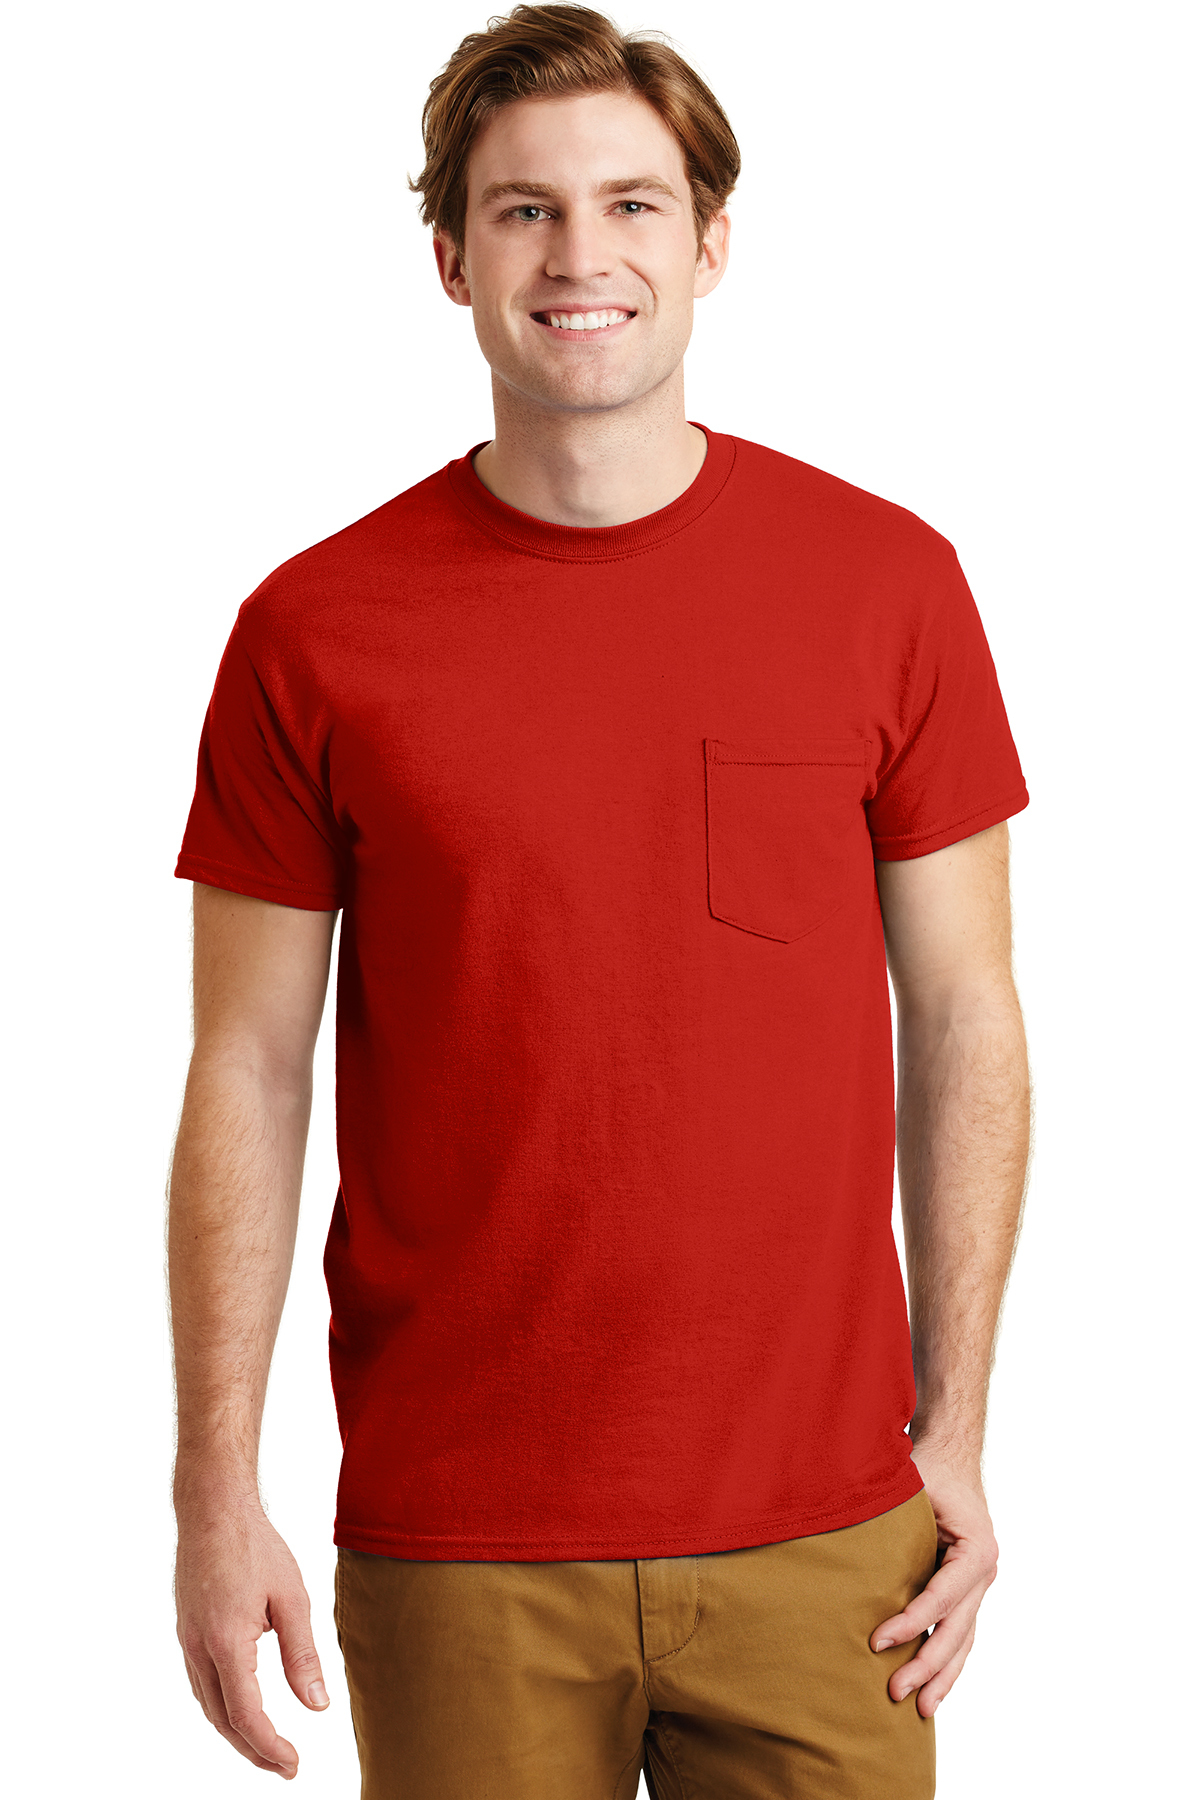 aa11001b Gildan® - DryBlend® 50 Cotton/50 Poly Pocket T-Shirt | 50/50 Blend ...